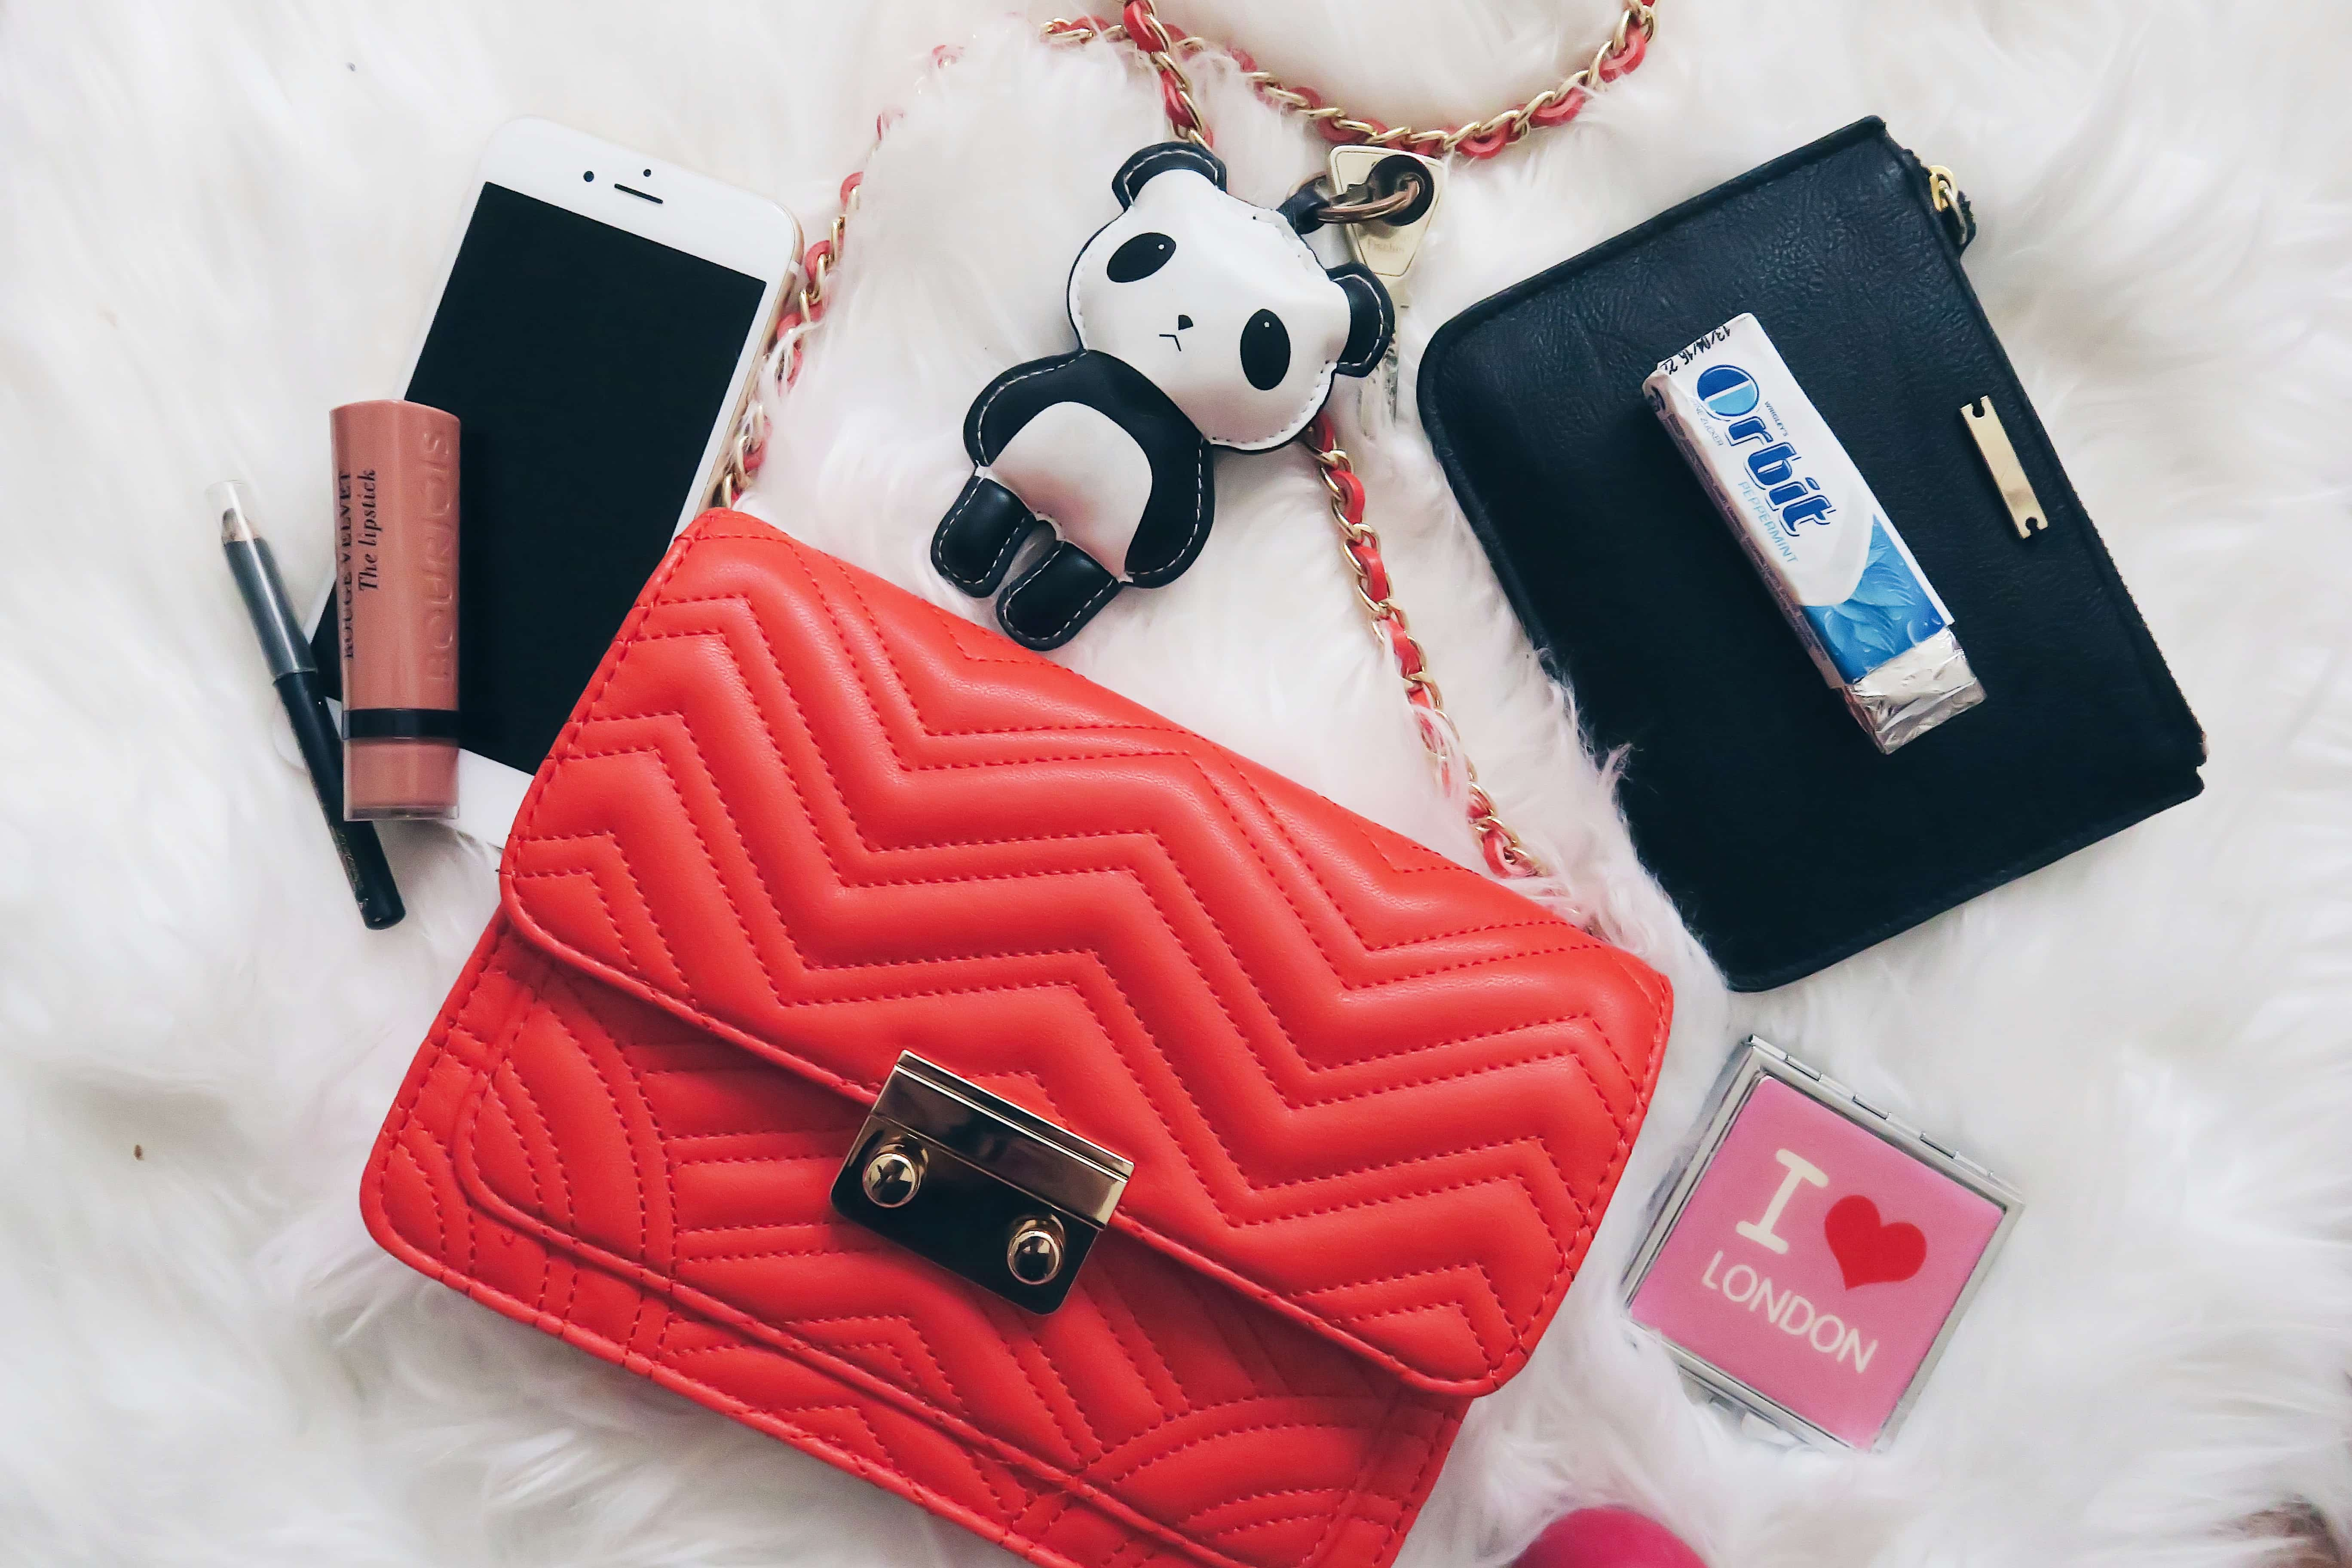 whats in my bag was ist in meiner tasche